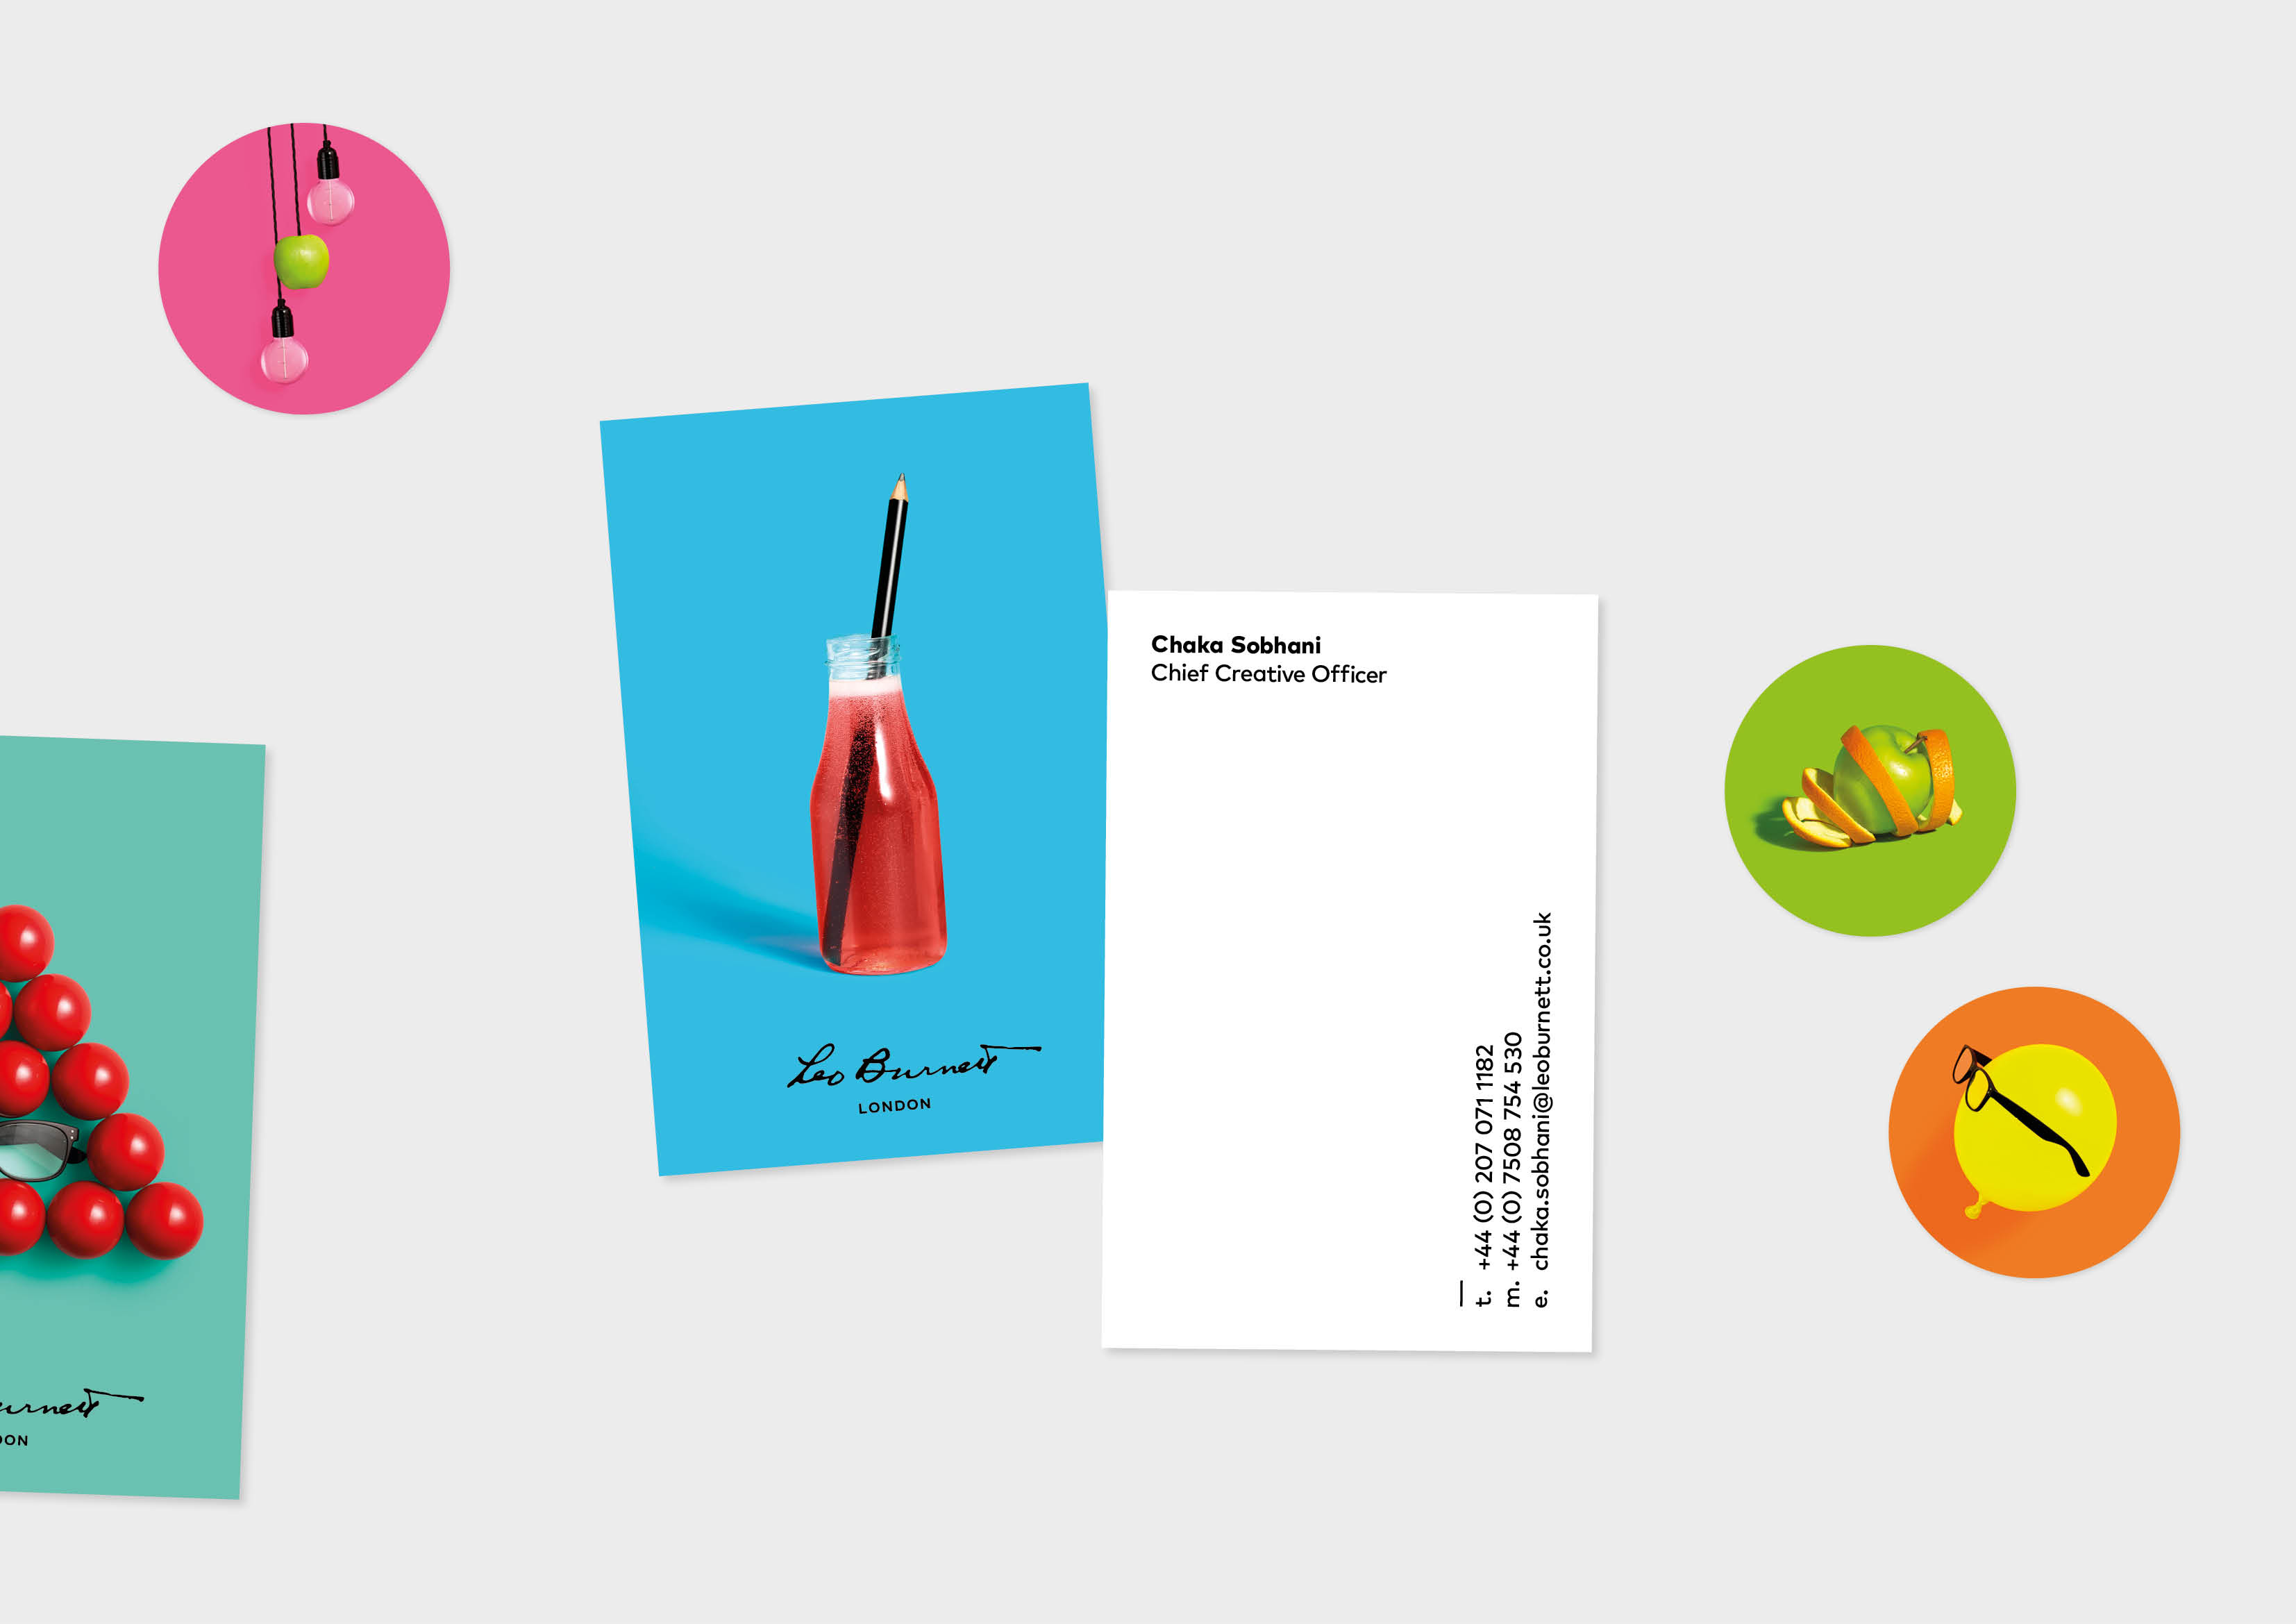 Leo Burnett Updates Its Branding With Colourful Modern Twist